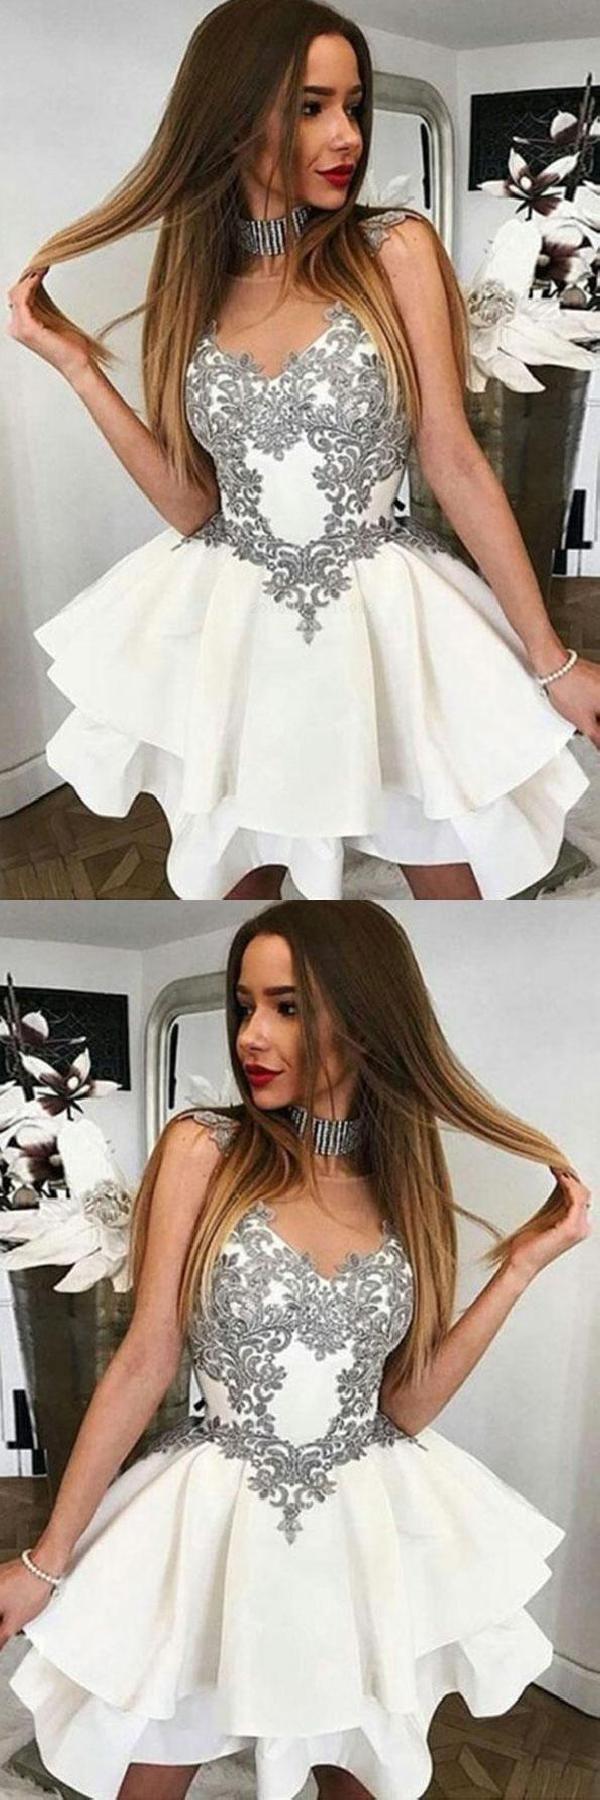 Ivory prom dress short homecoming dress prom dresses